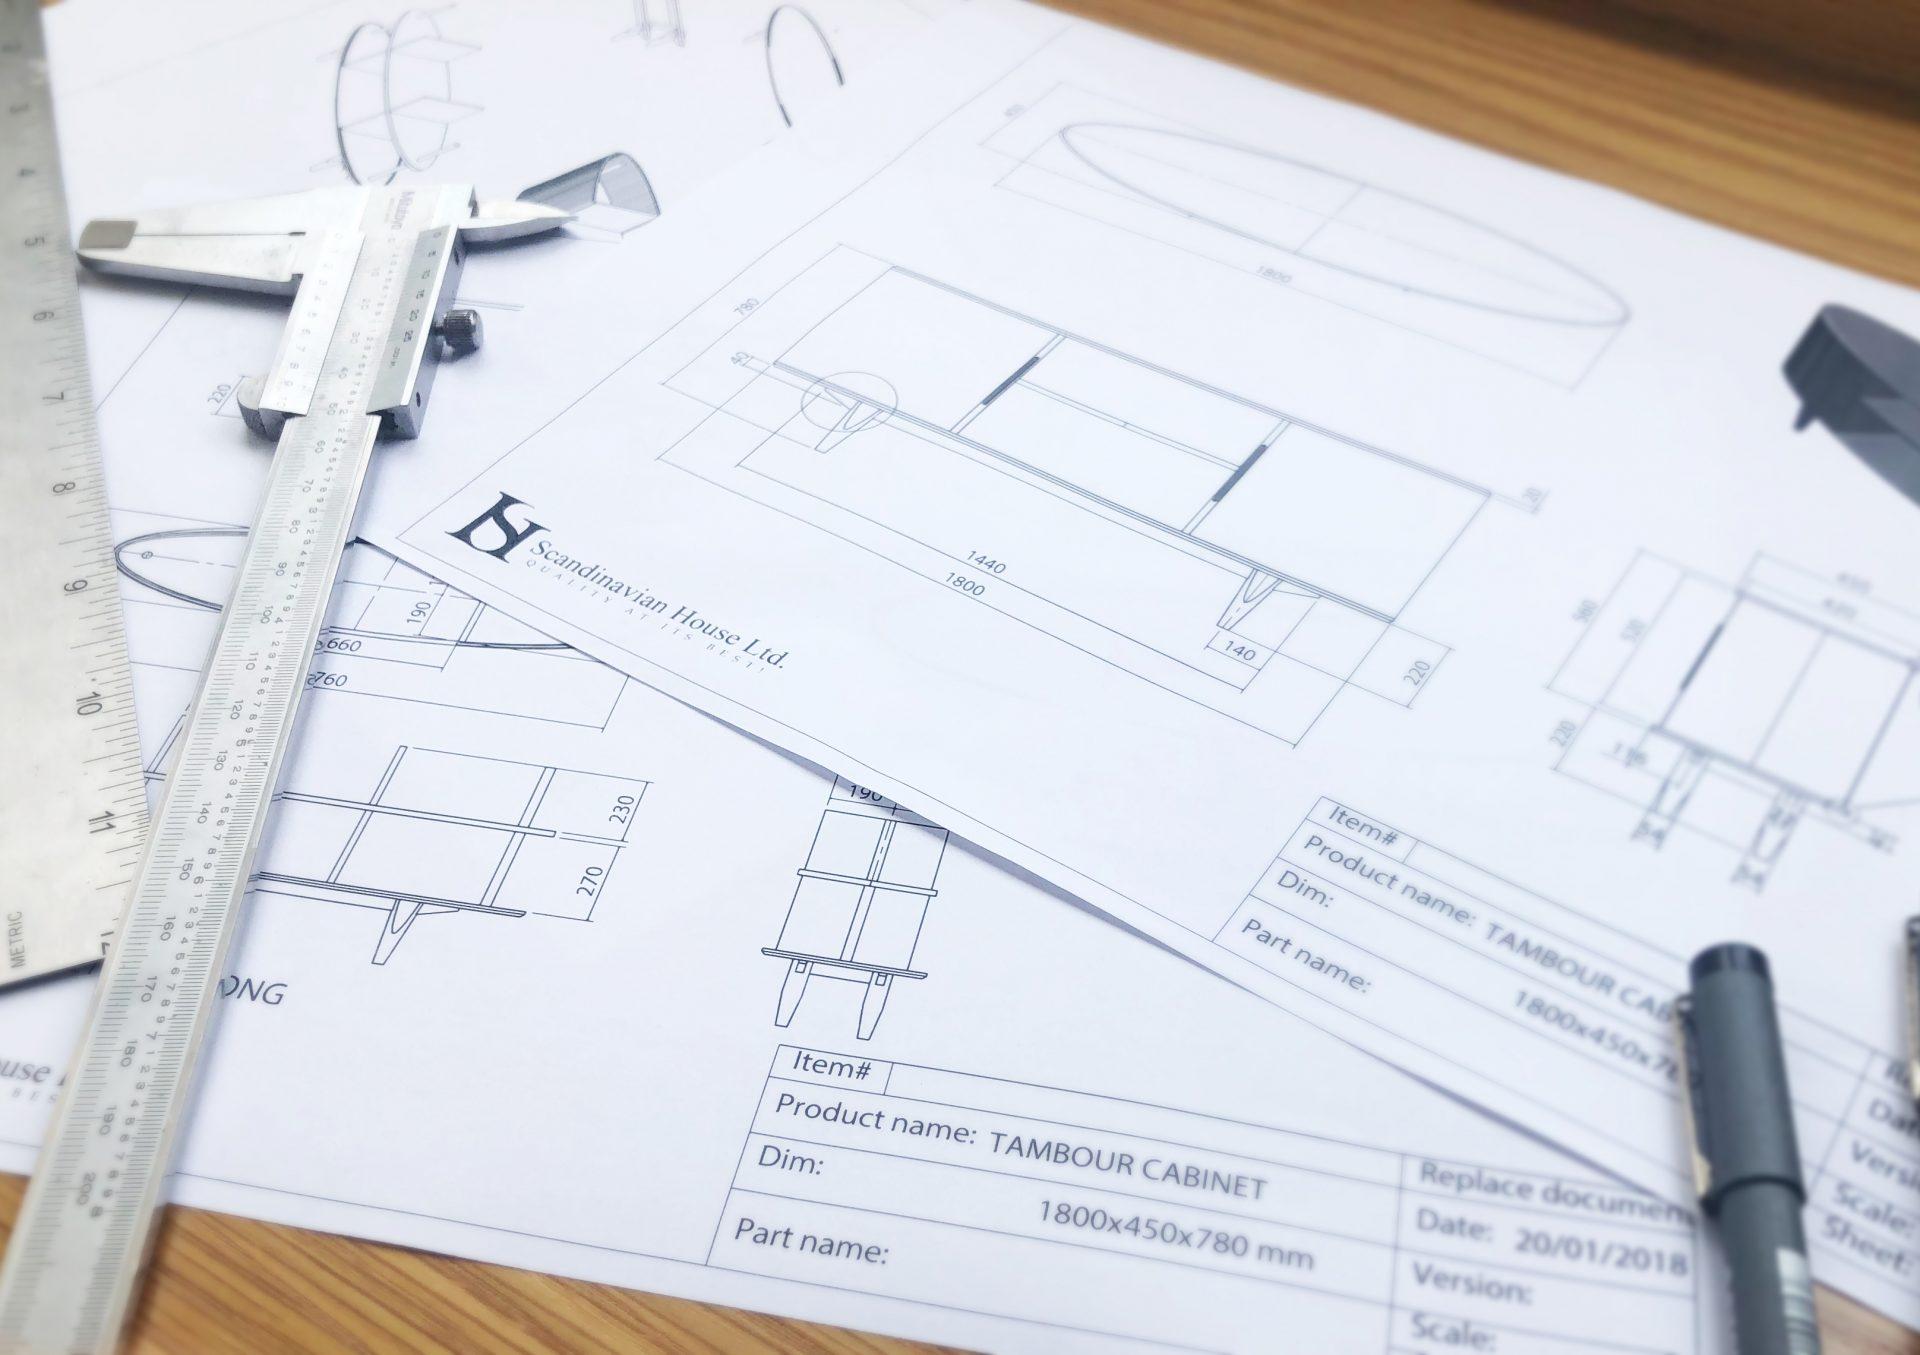 Manufacturing Technical Drawing Scandinavian House 02